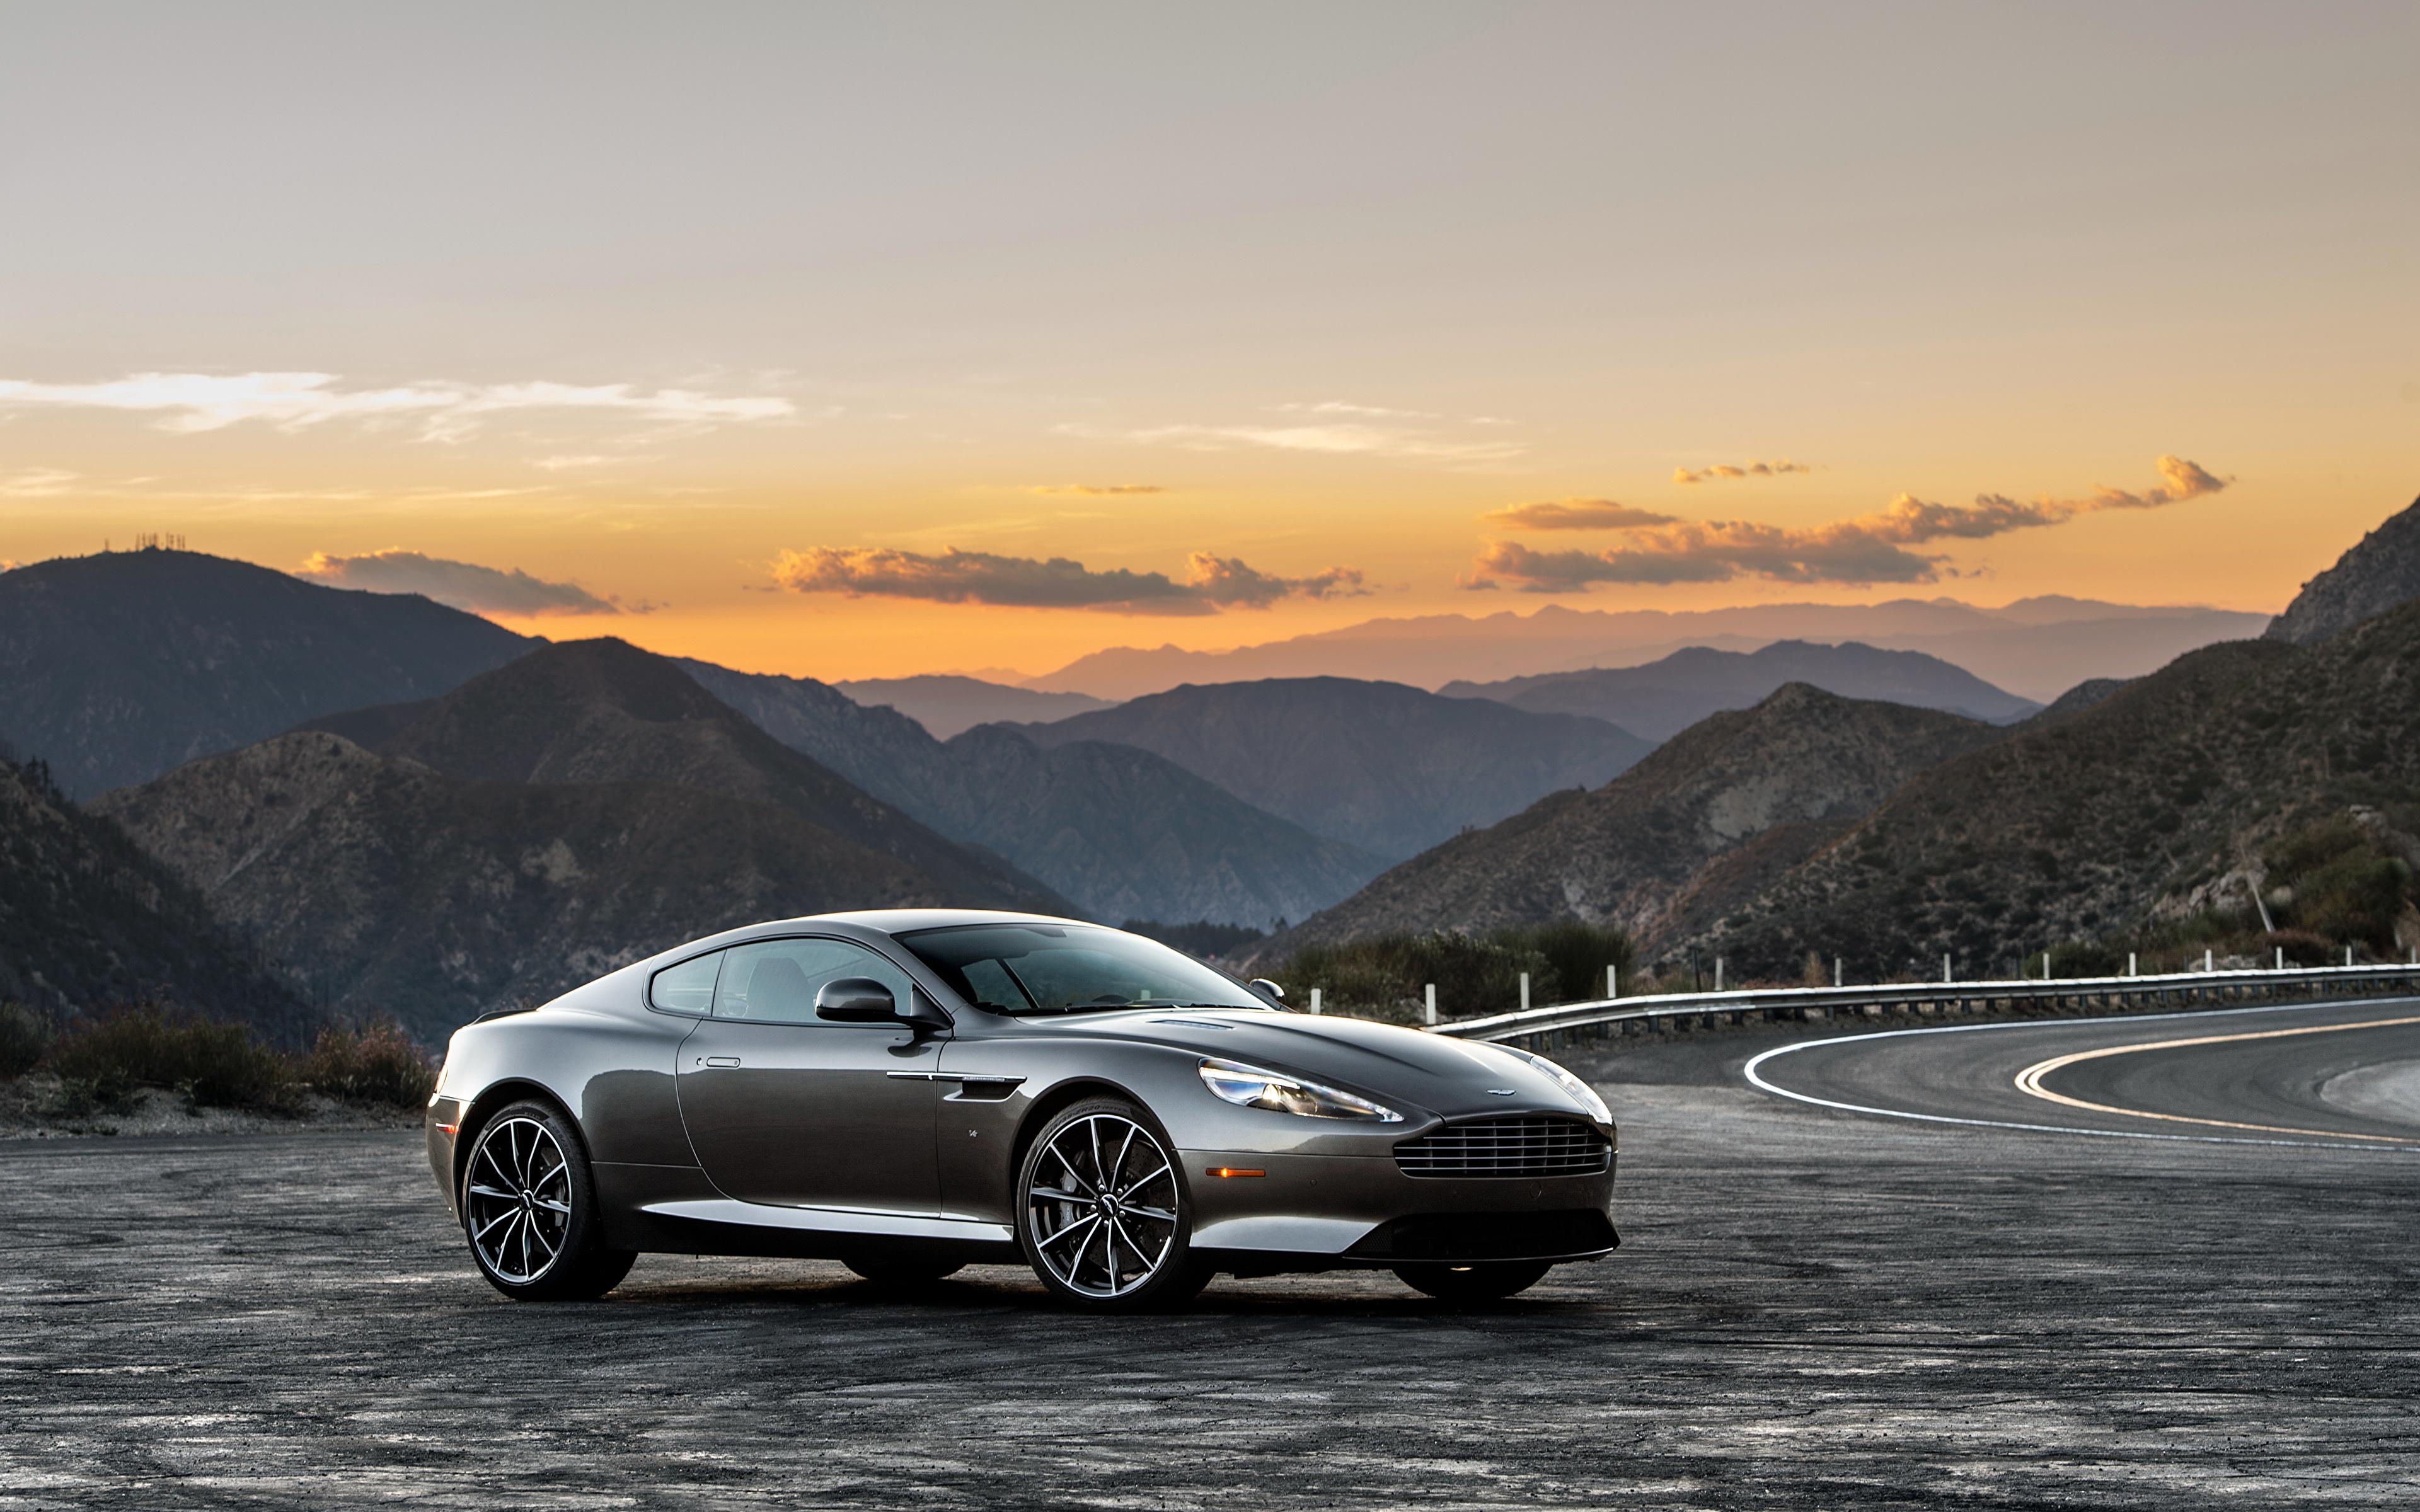 Images Aston Martin Db9 Gt Grey Auto 3840x2400